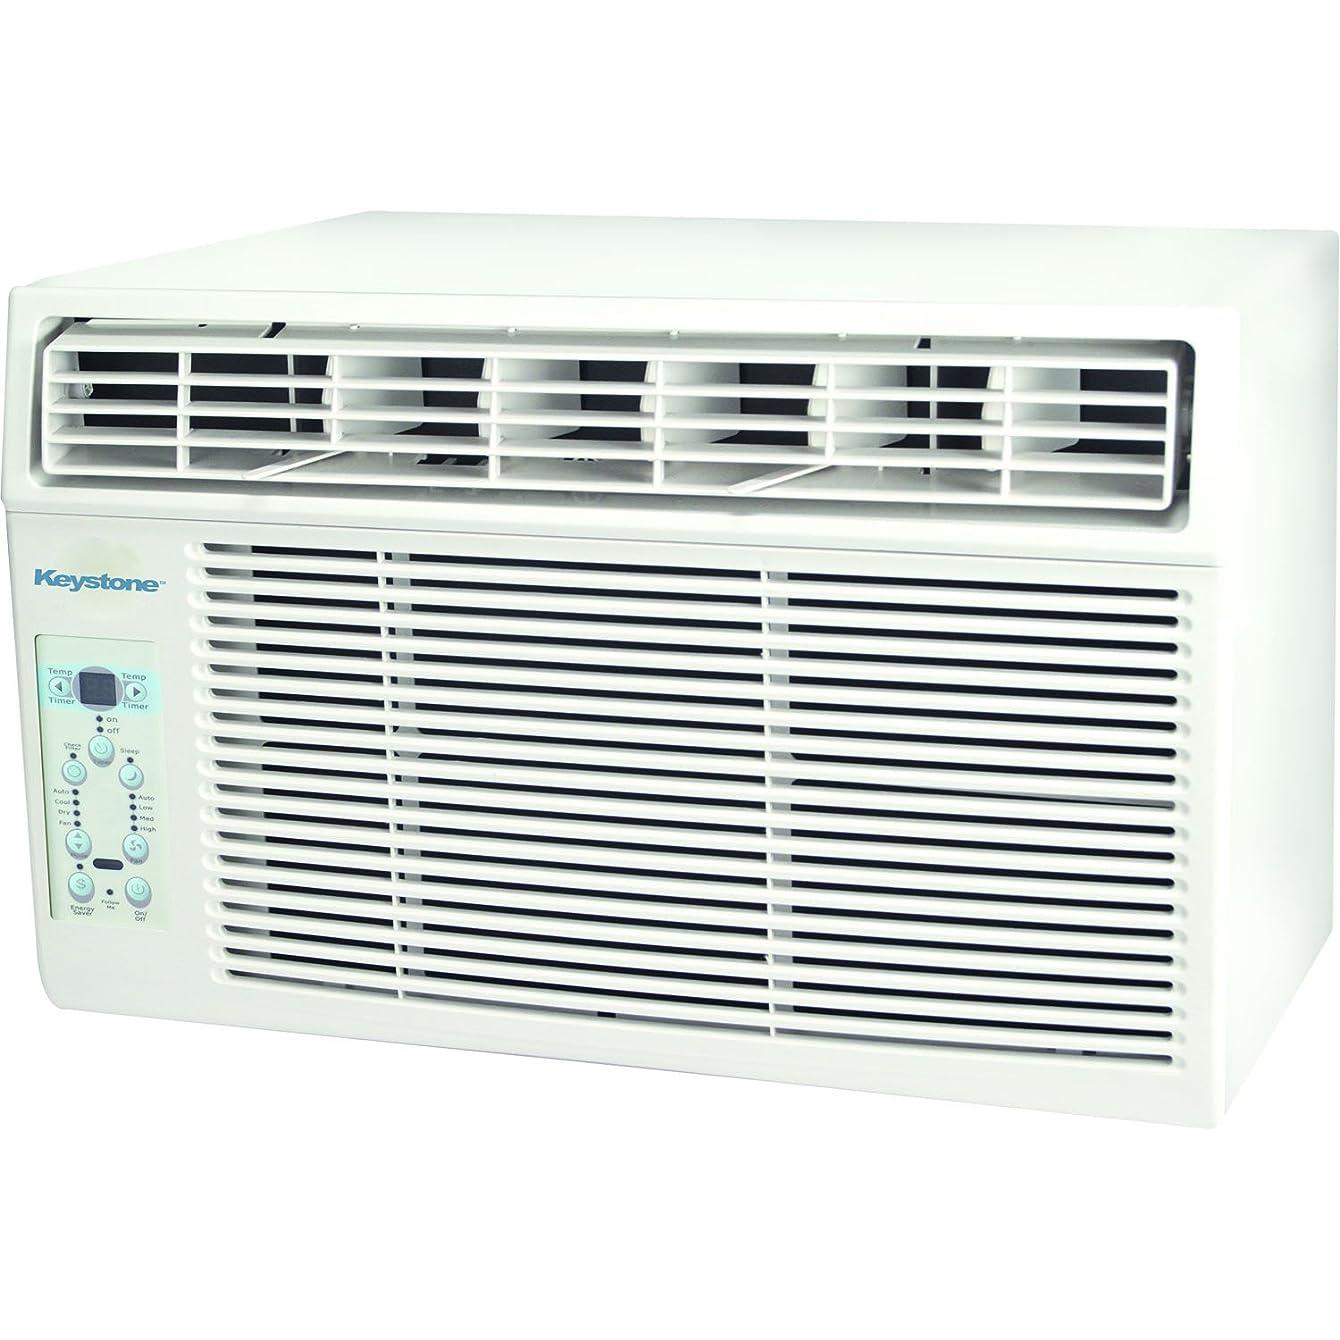 Keystone KSTAW05C 5000 BTU 115V Window-Mounted Air Conditioner with Follow Me LCD Remote Control